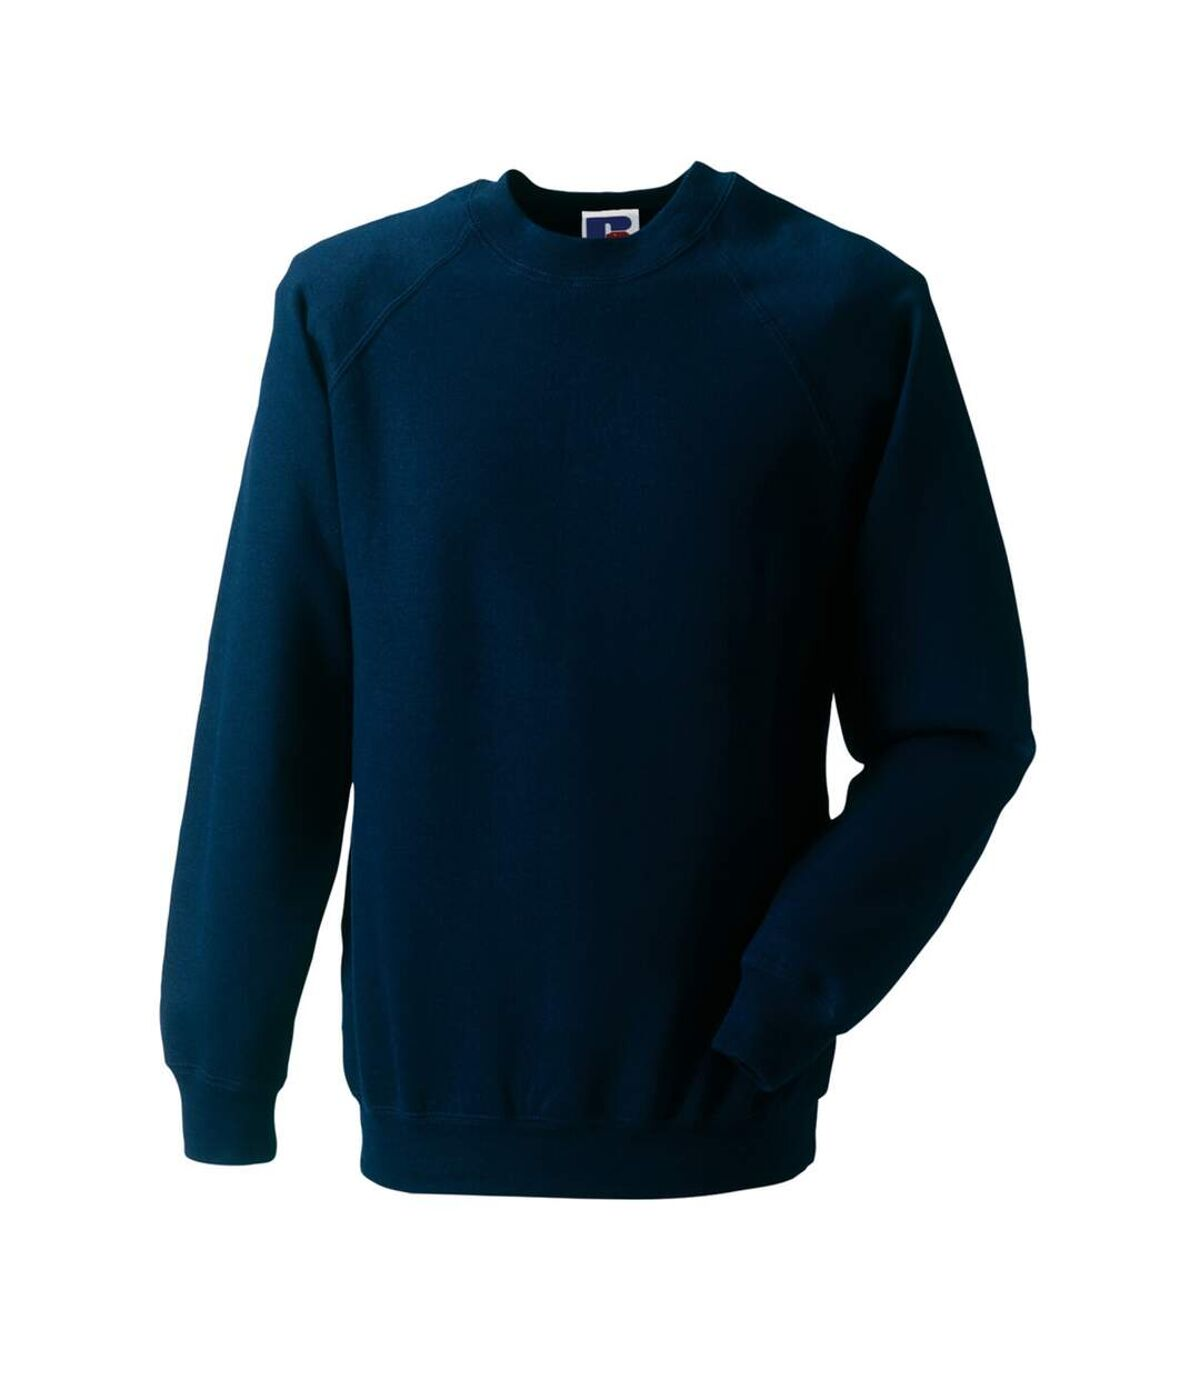 Russell Classic Sweatshirt (Bright Royal) - UTBC573